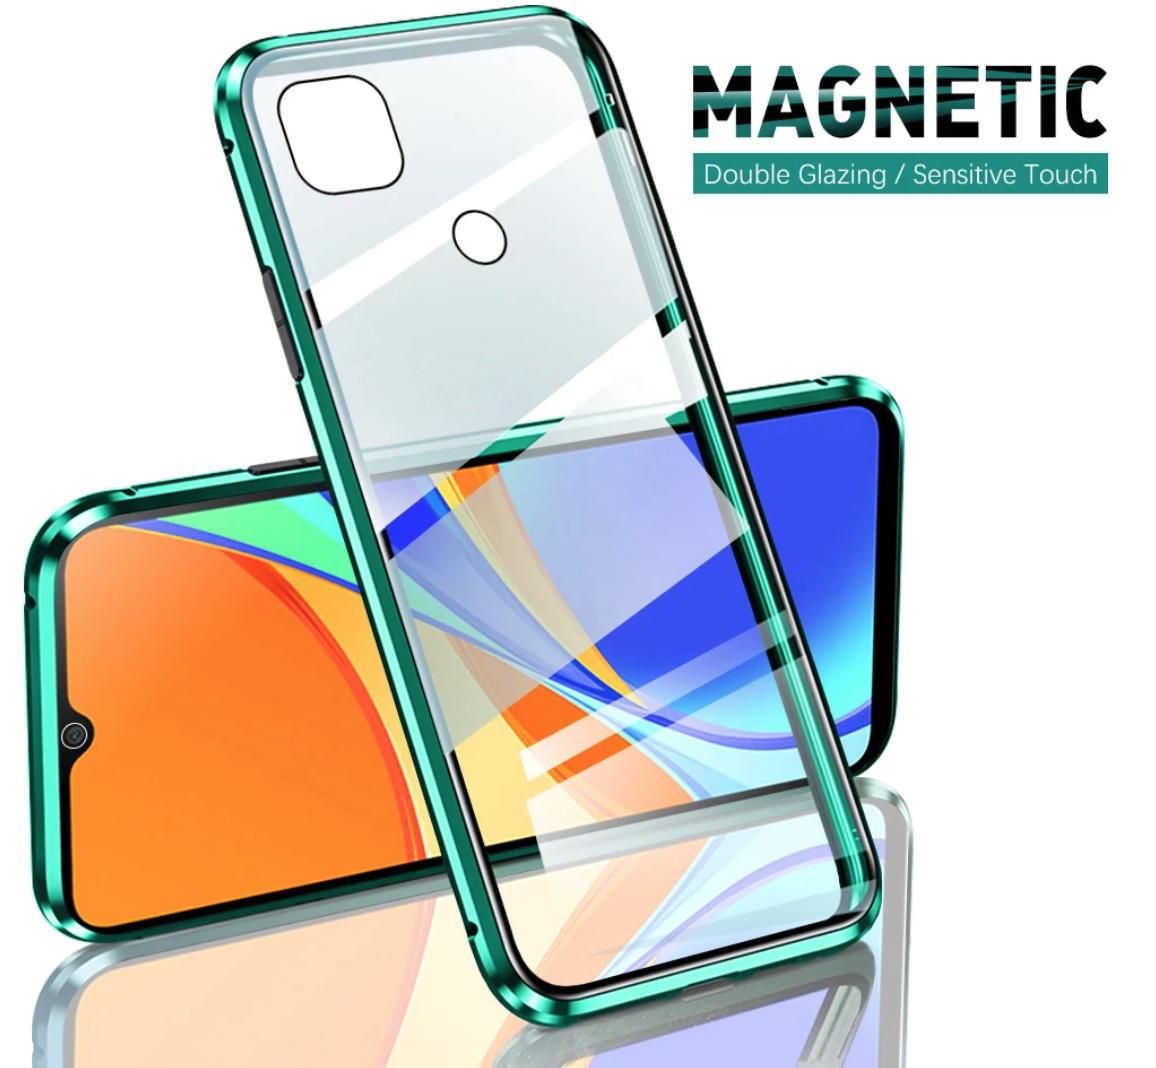 Магнитный металл чехол FULL GLASS 360° для Xiaomi Redmi 9C